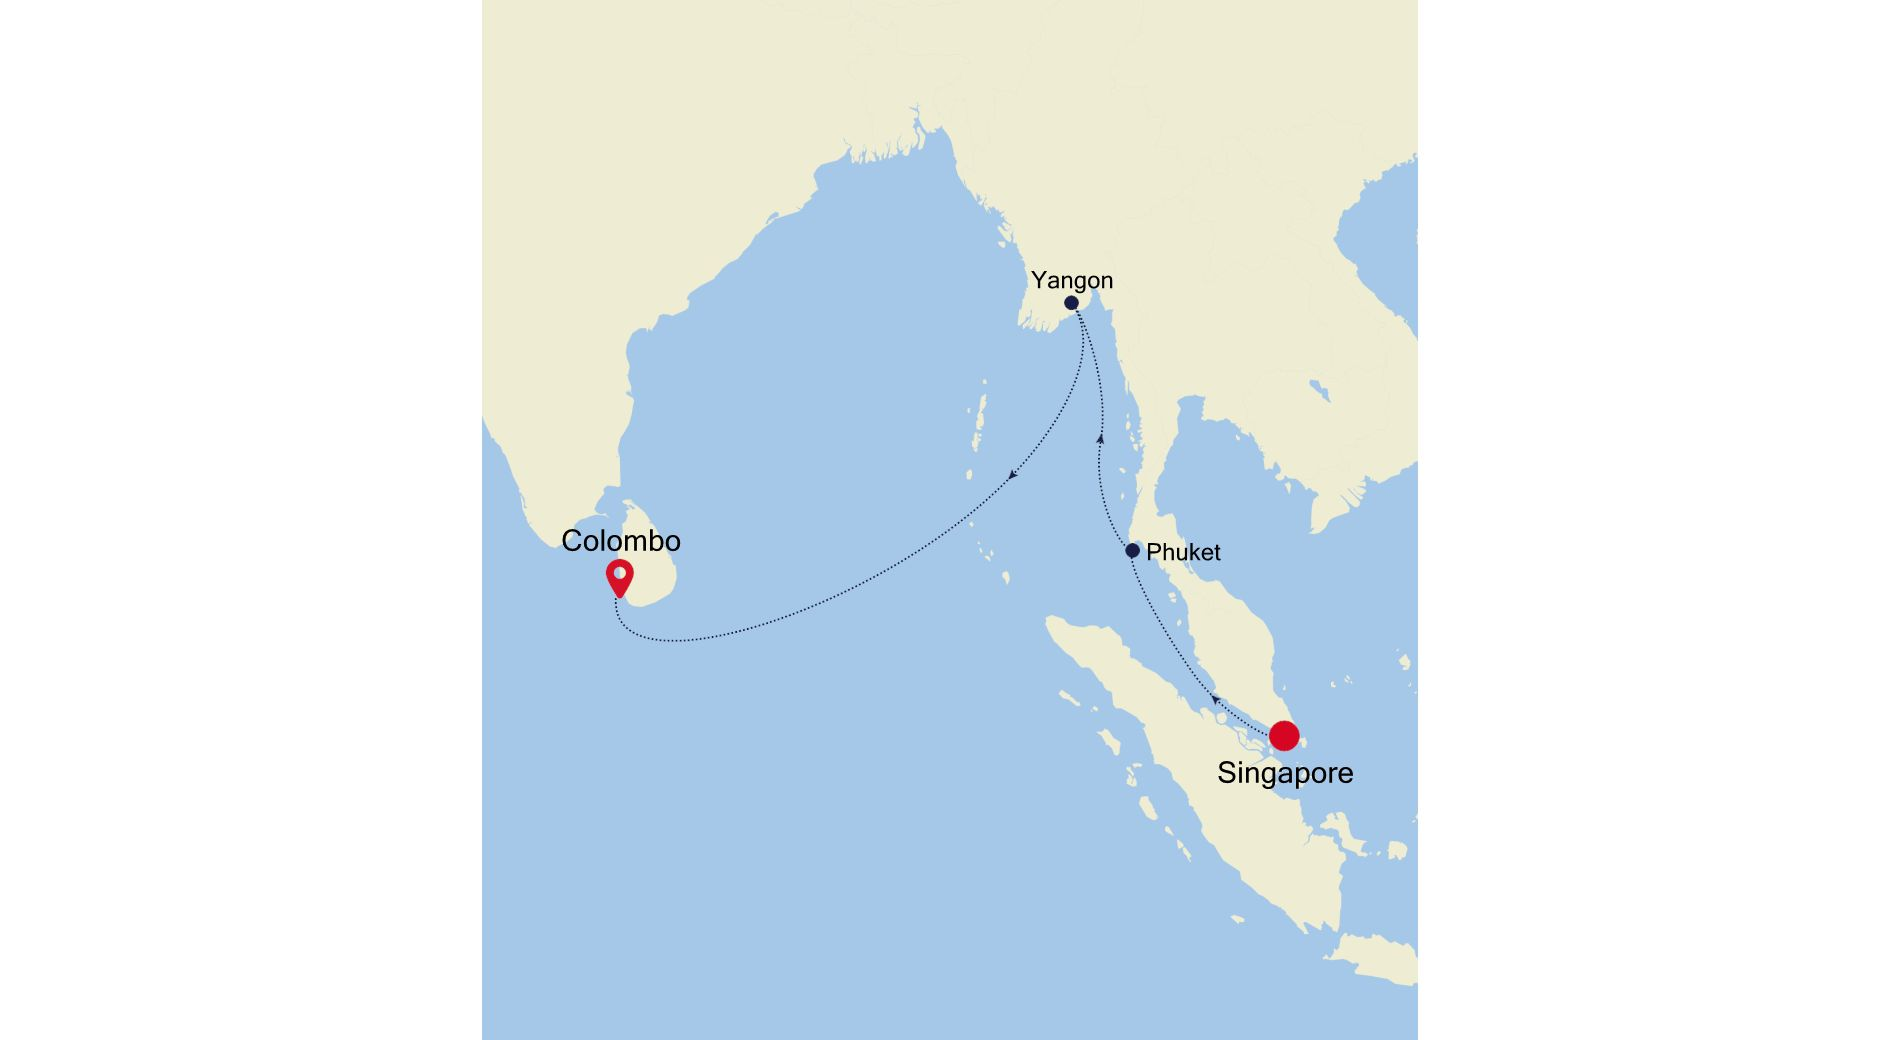 5005E - Singapore à Colombo